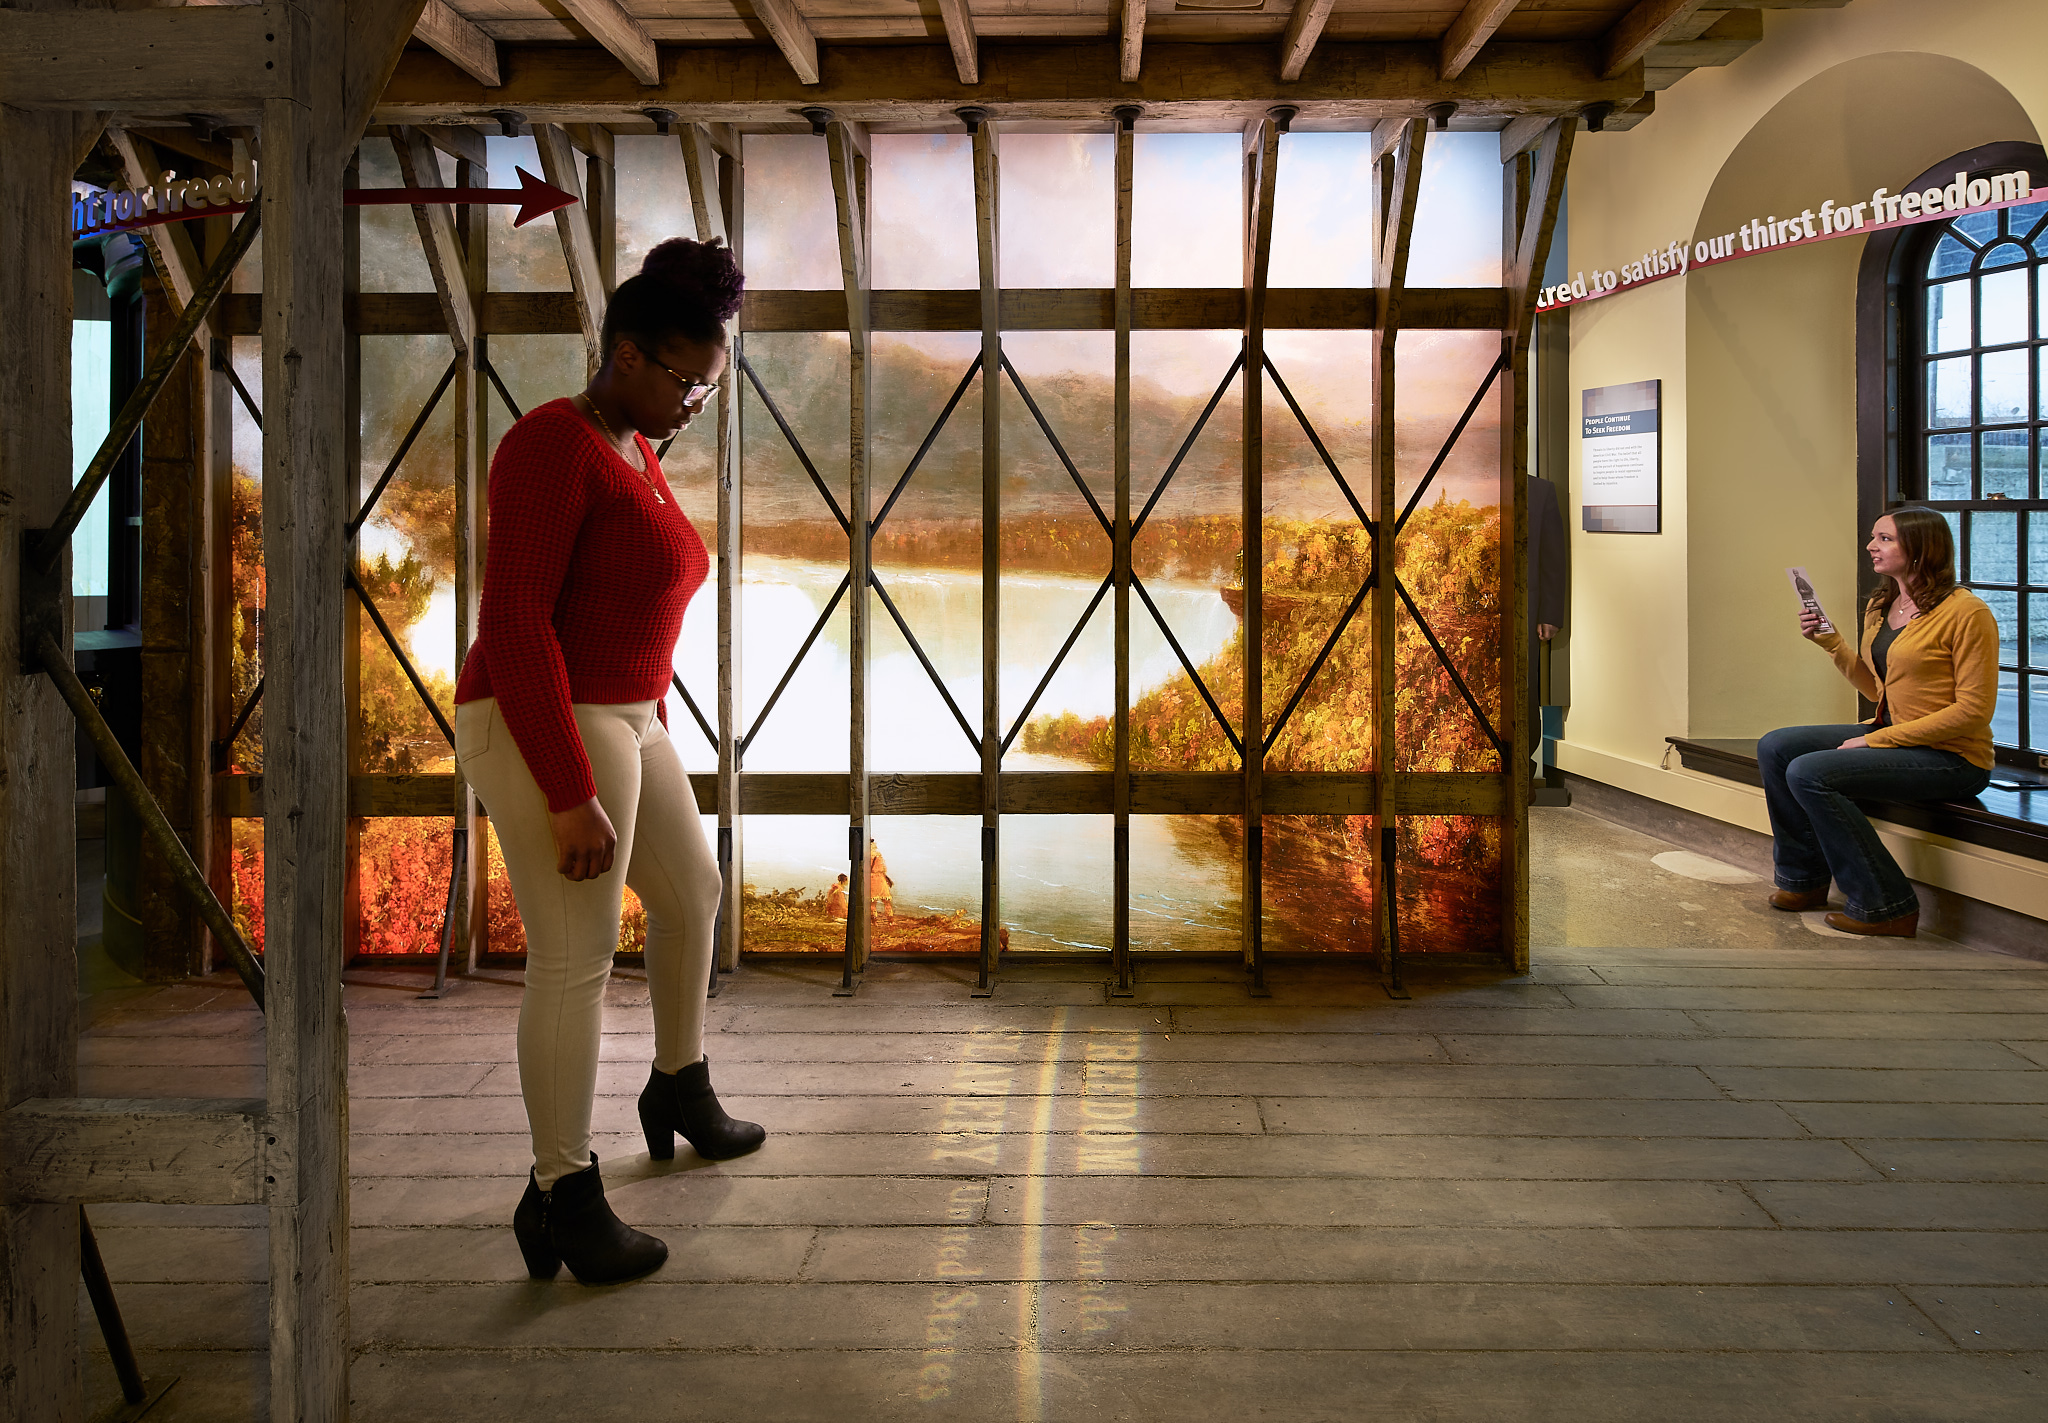 Suspension Bridge - Niagara Falls Underground Railroad Heritage Center ©Kim Smith